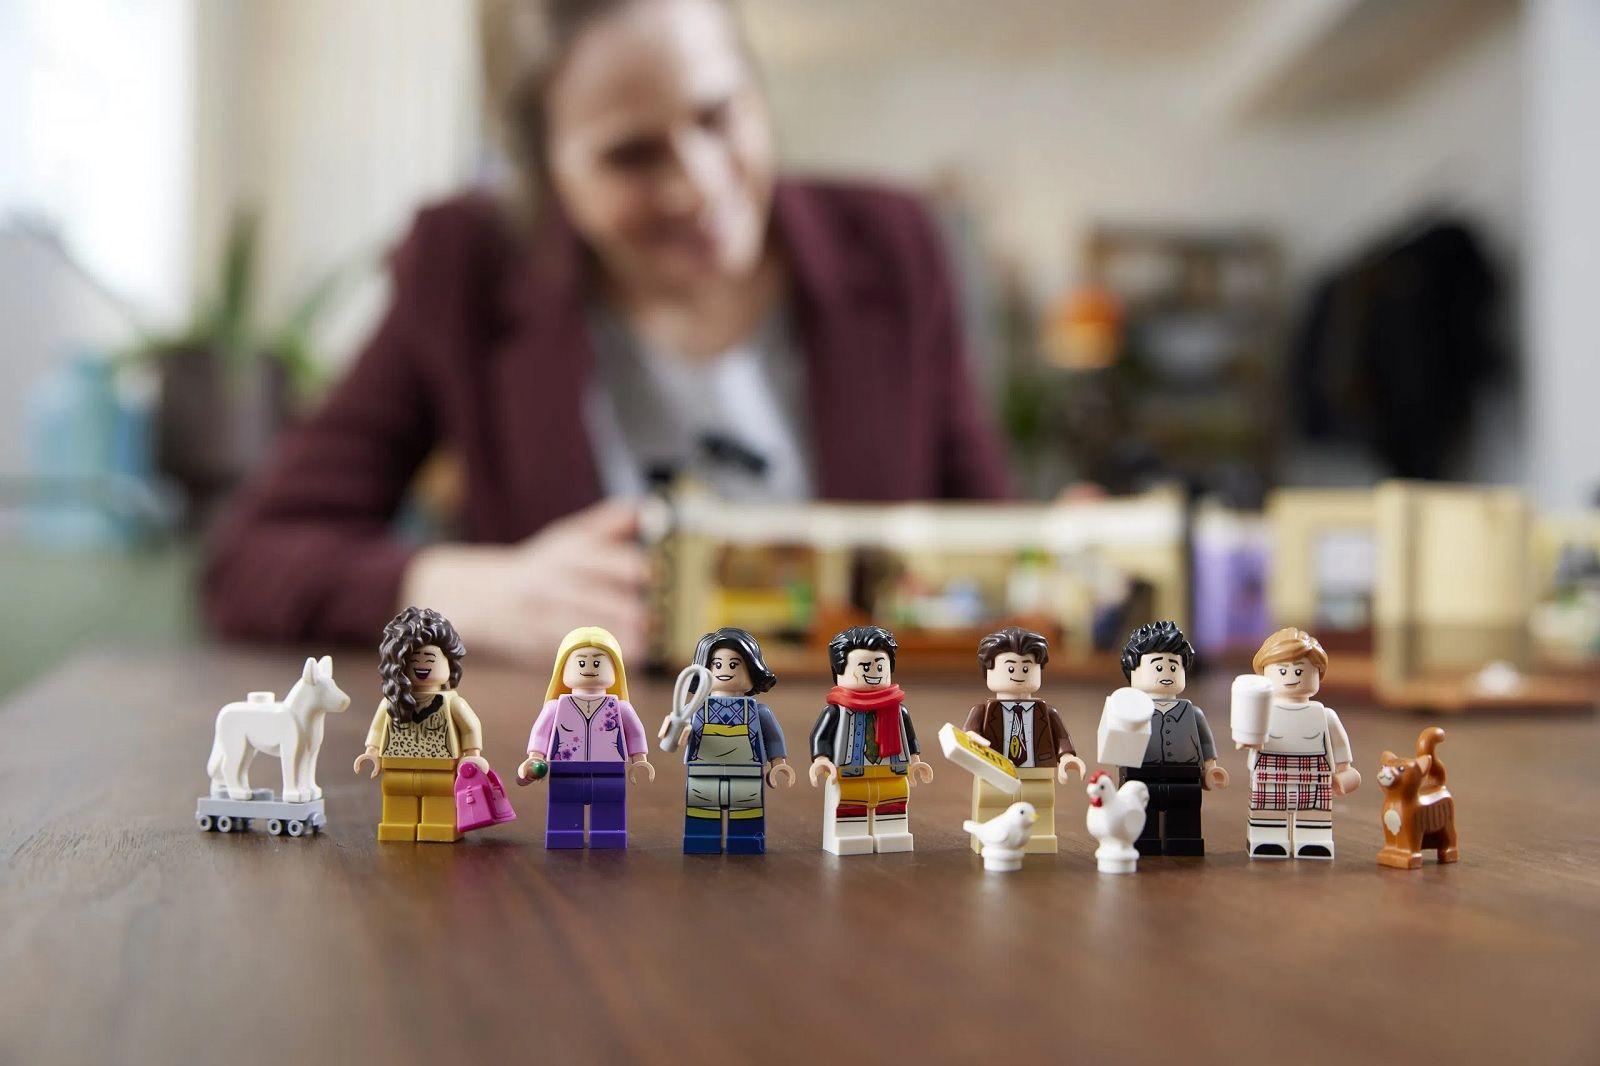 Cast Friends Lego - neomag.